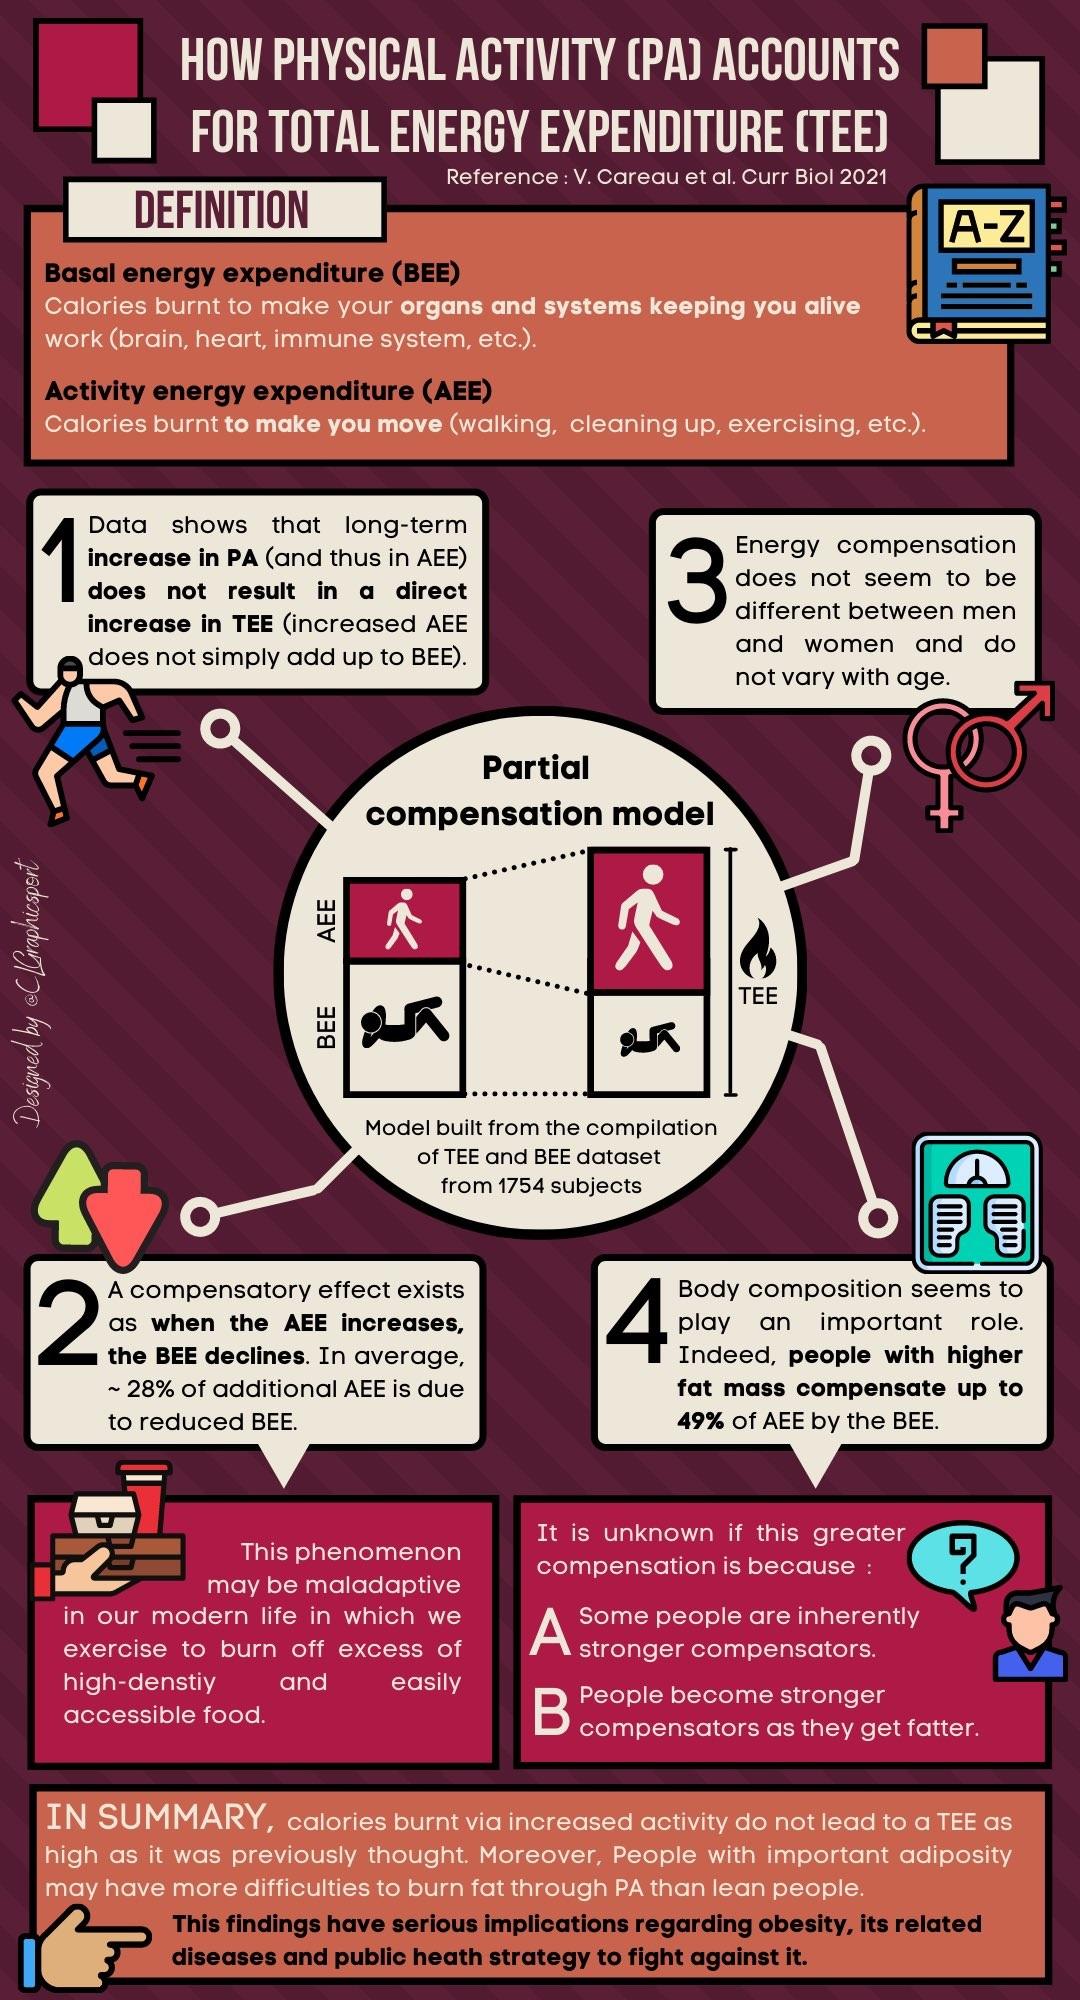 Careau Infographic